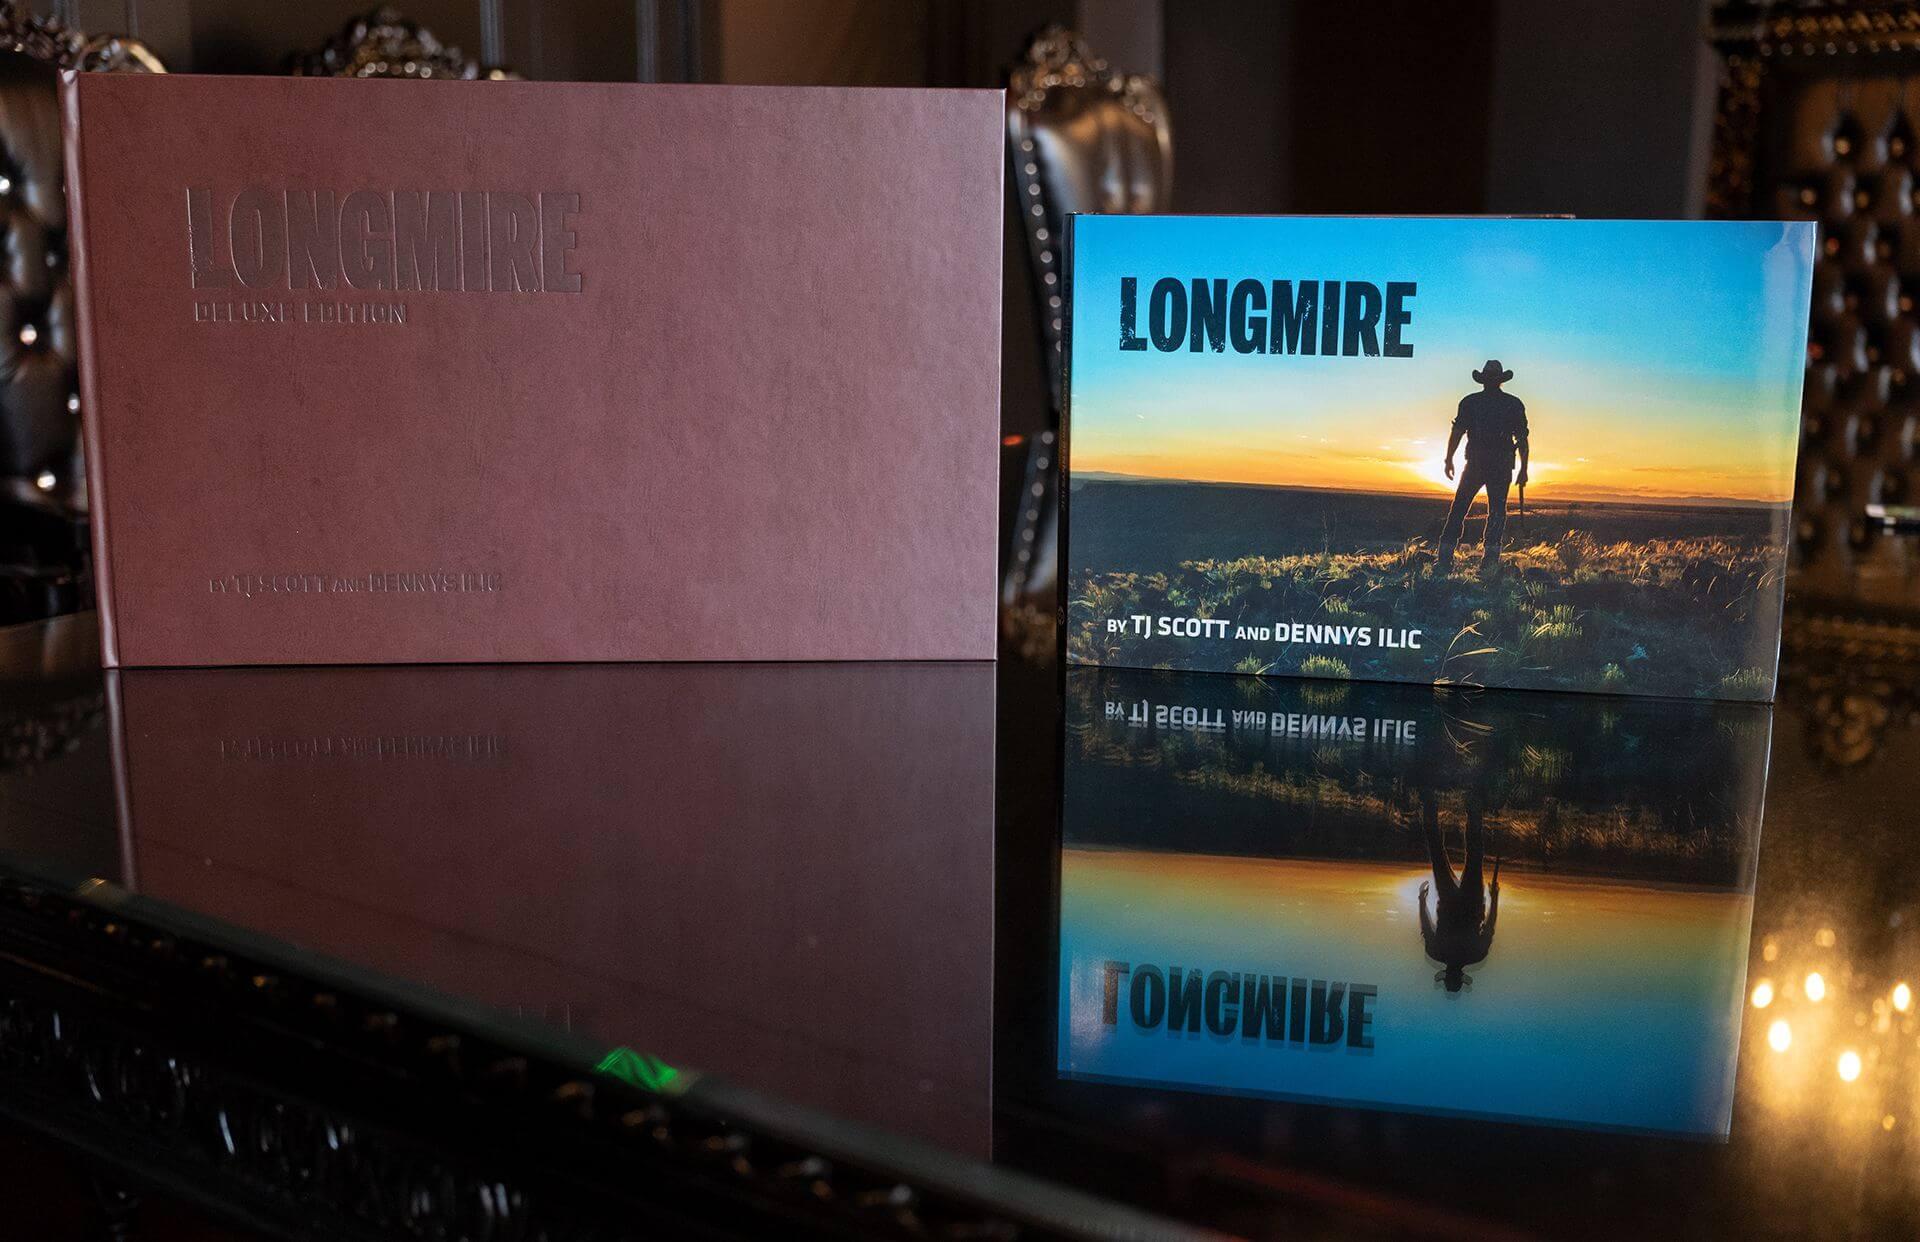 Longmire-Deluxe-3.jpg